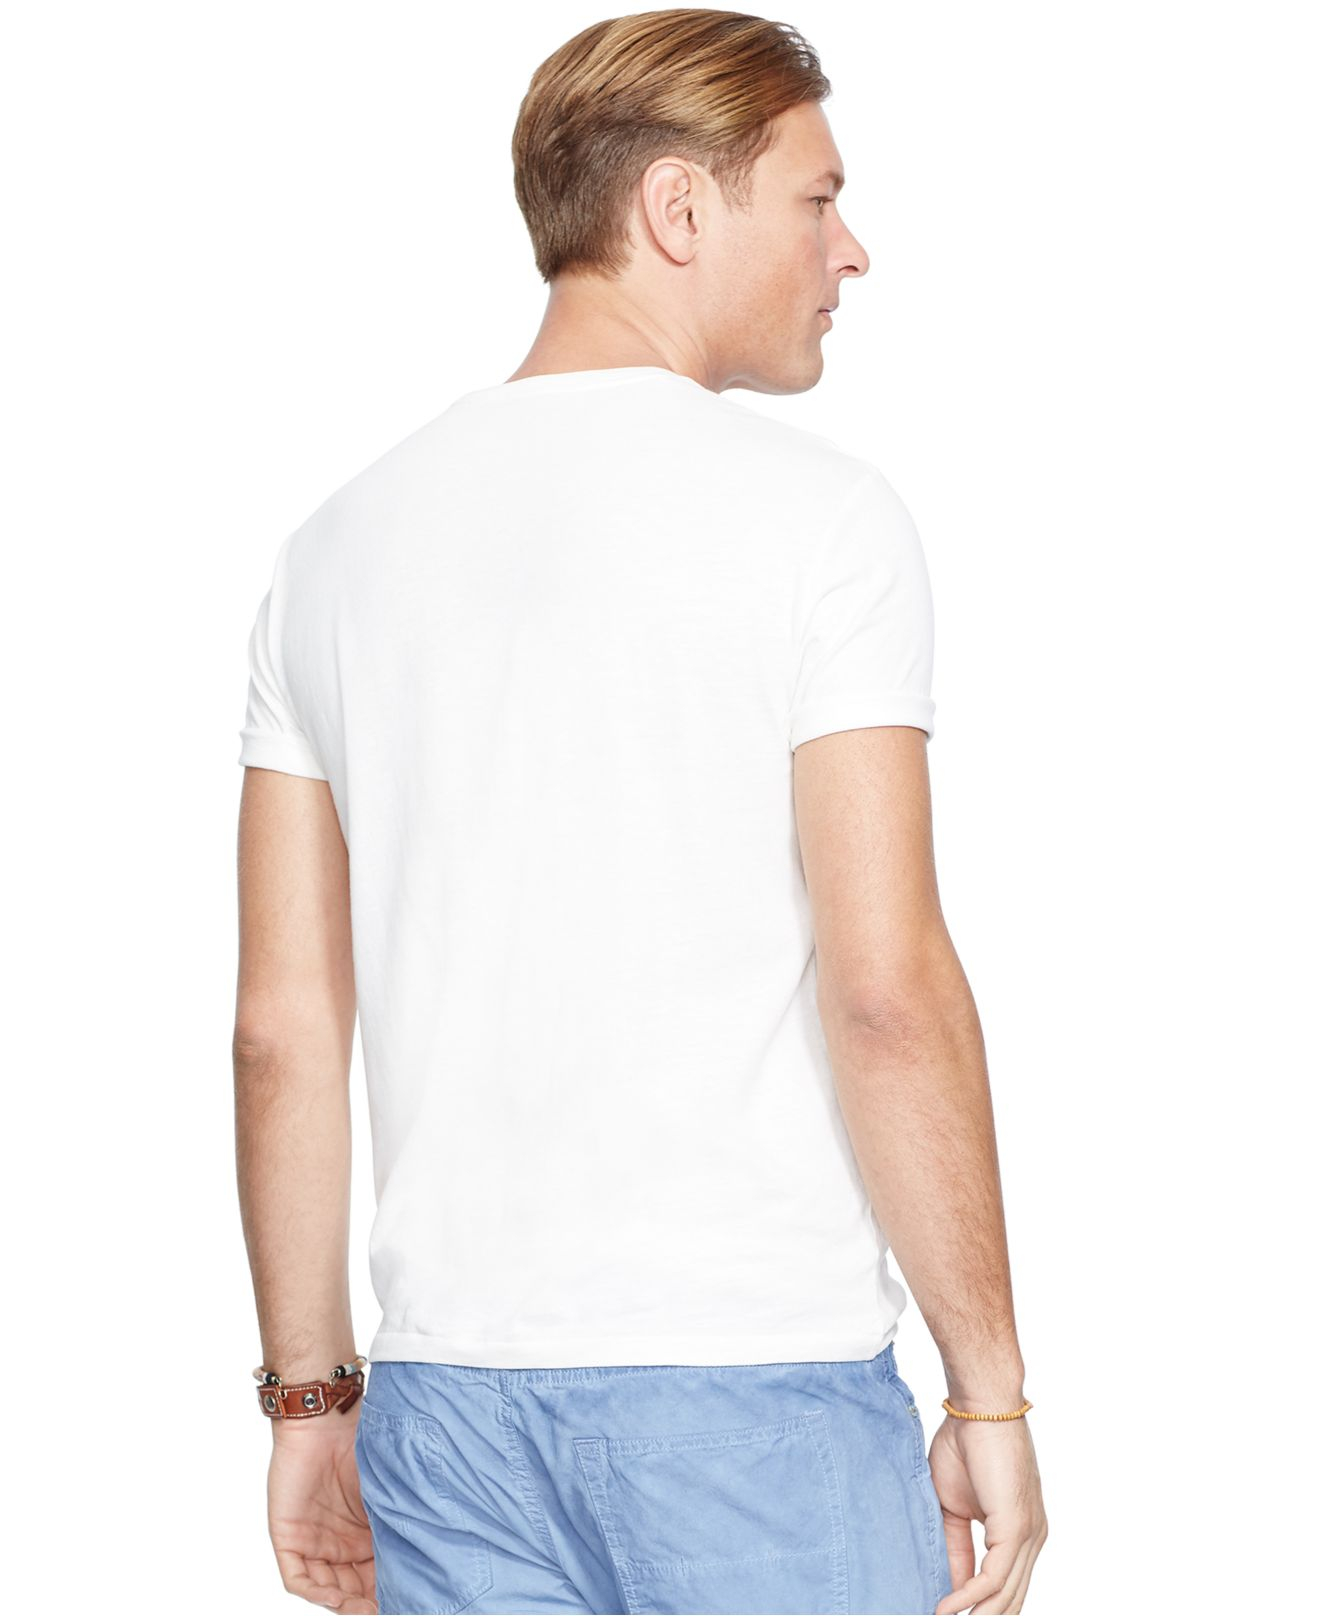 Polo ralph lauren big and tall surf print graphic t shirt for Big and tall printed t shirts